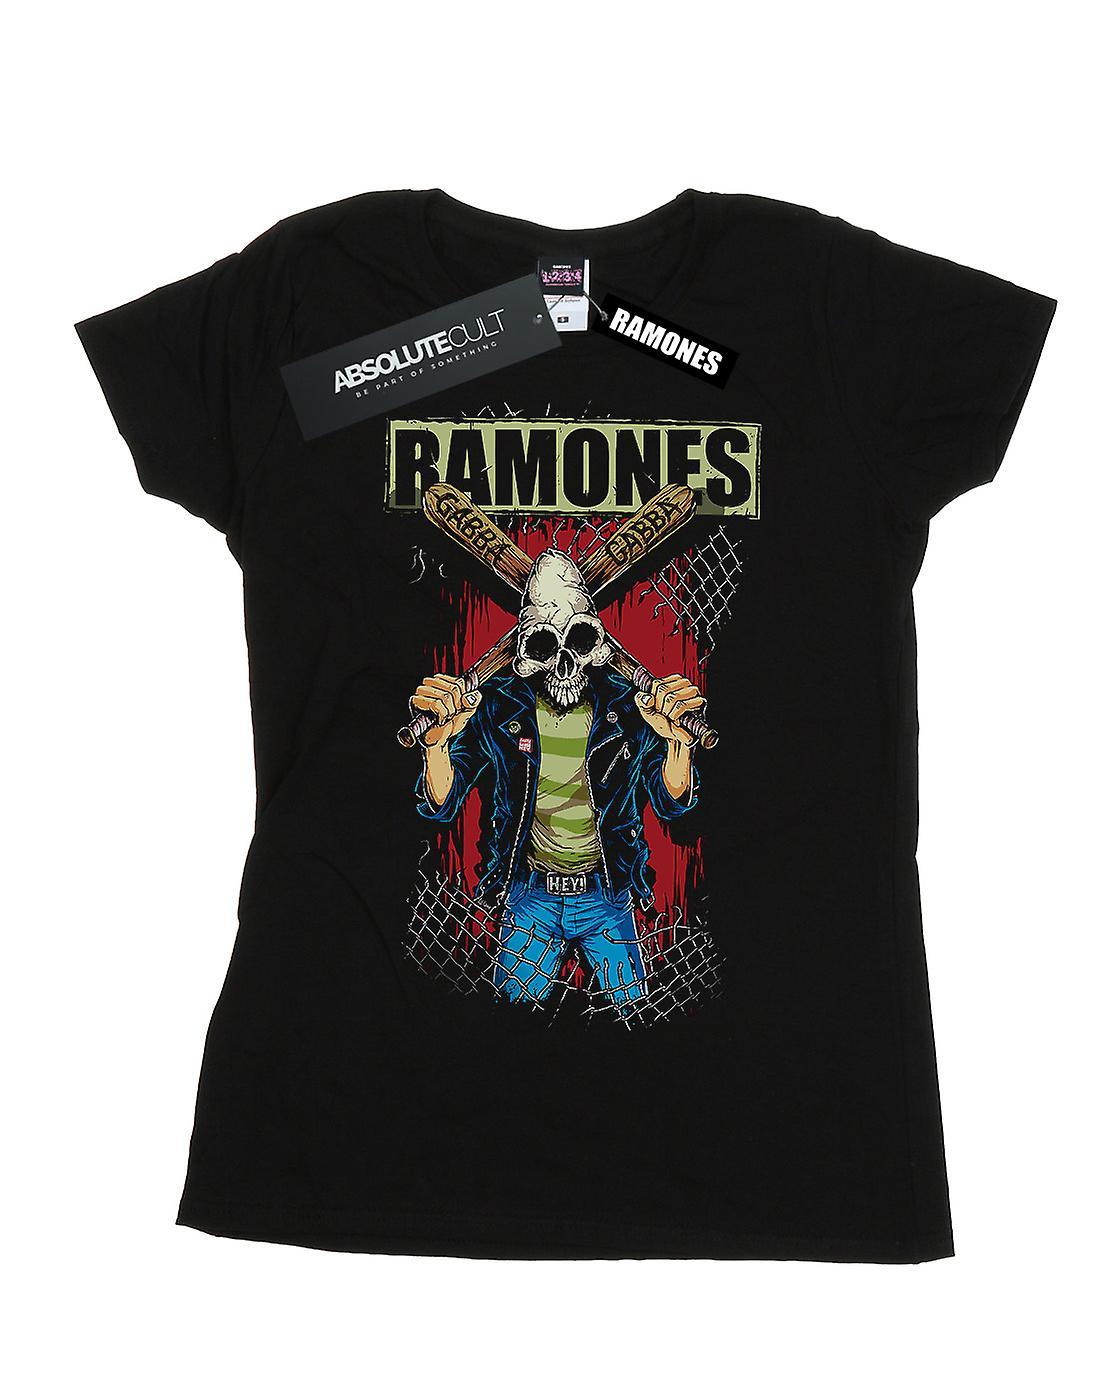 Ramones Women's Gabba Gabba Hey Pinhead T-Shirt